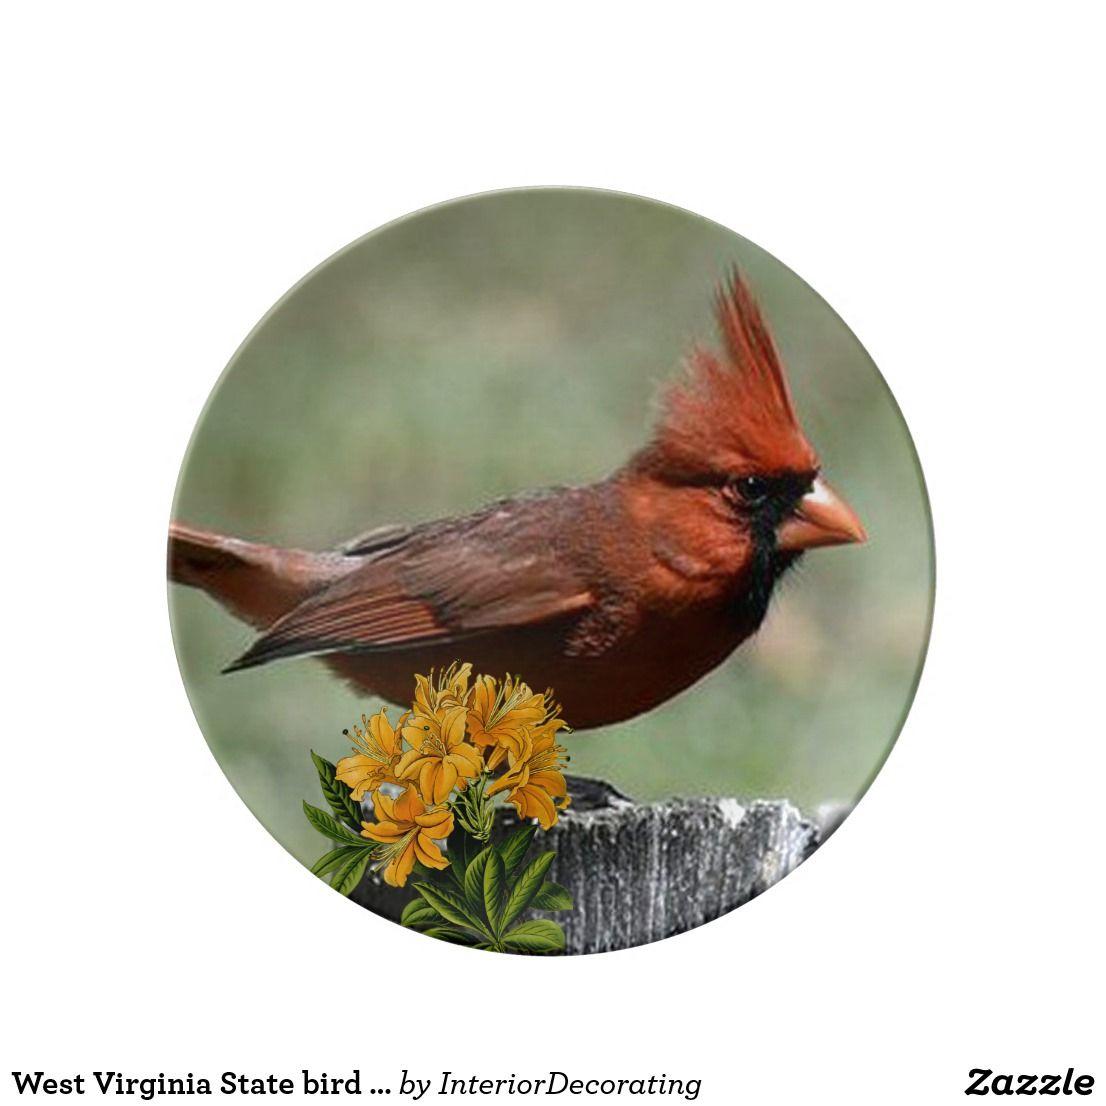 West Virginia State Bird And Flower Dinner Plate